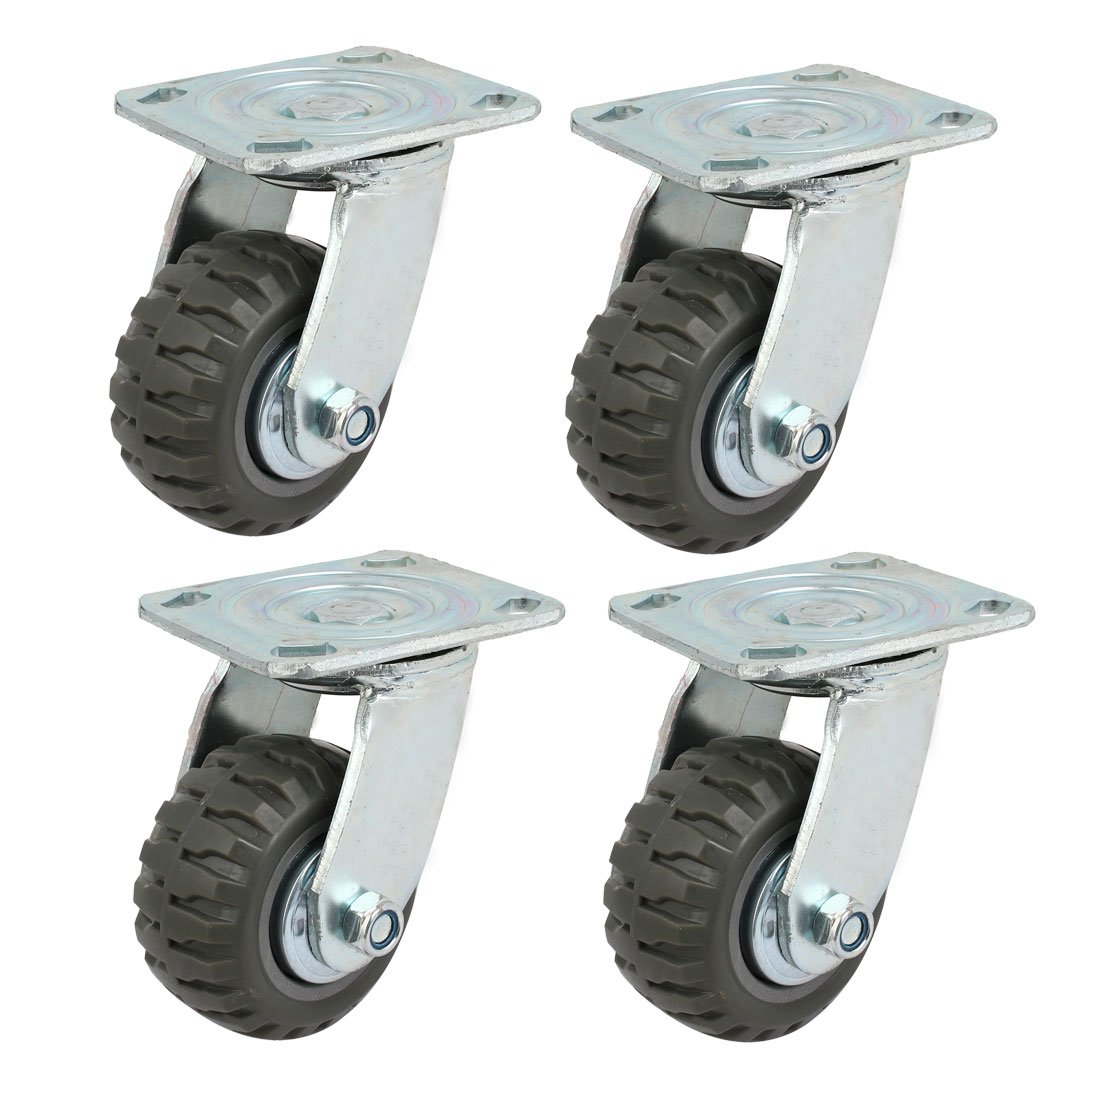 uxcell 4-inch Diameter Single Wheel Swiveling Top Plate Industrial Caster Roller 4pcs